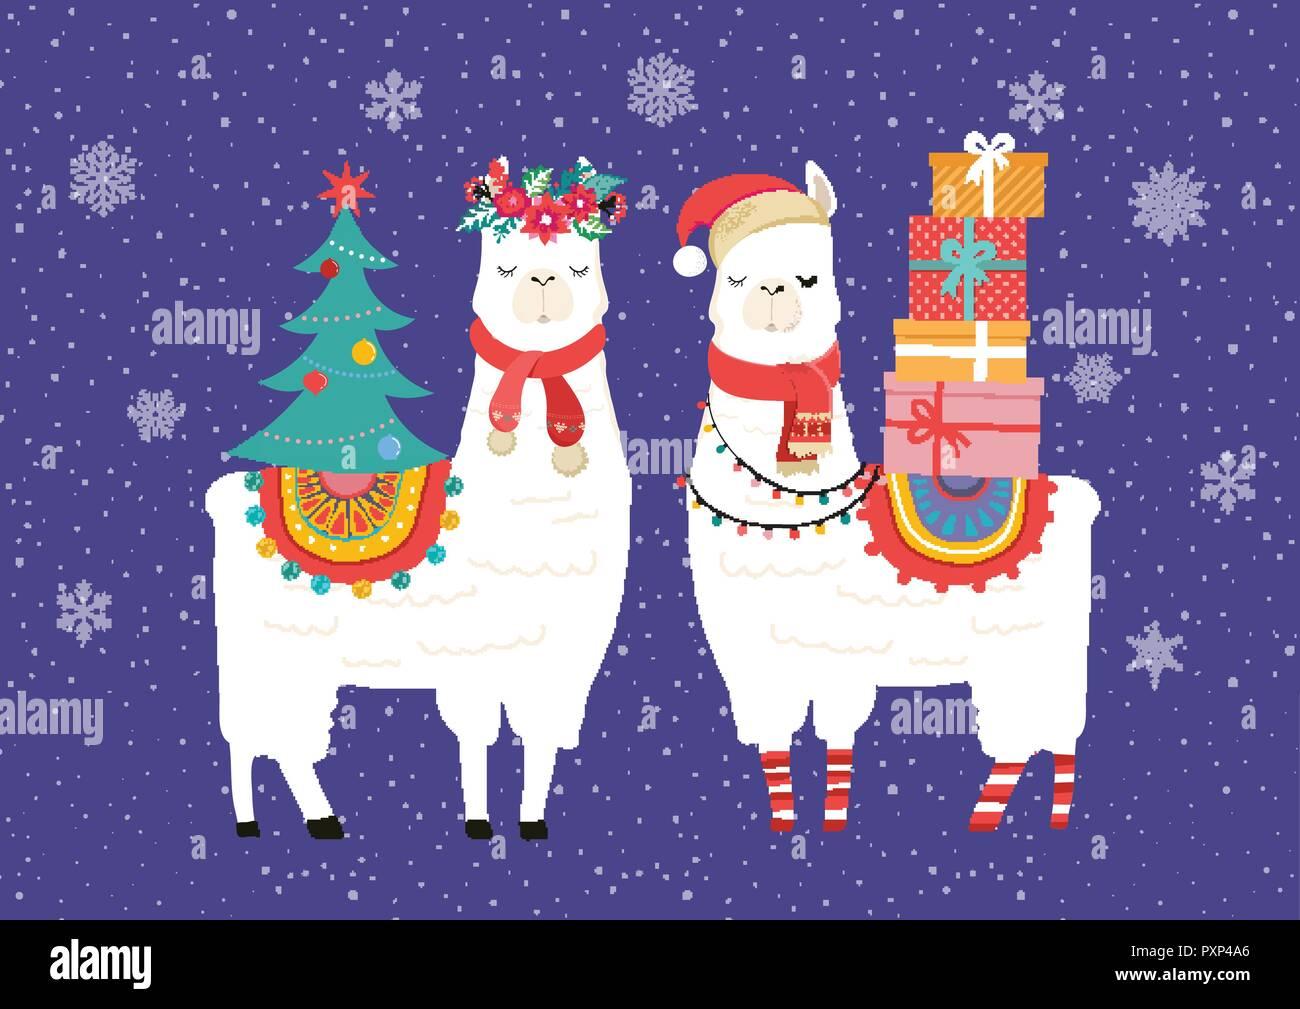 Christmas Birthday Images.Llama Winter Illustration Cute Design For Nursery Poster